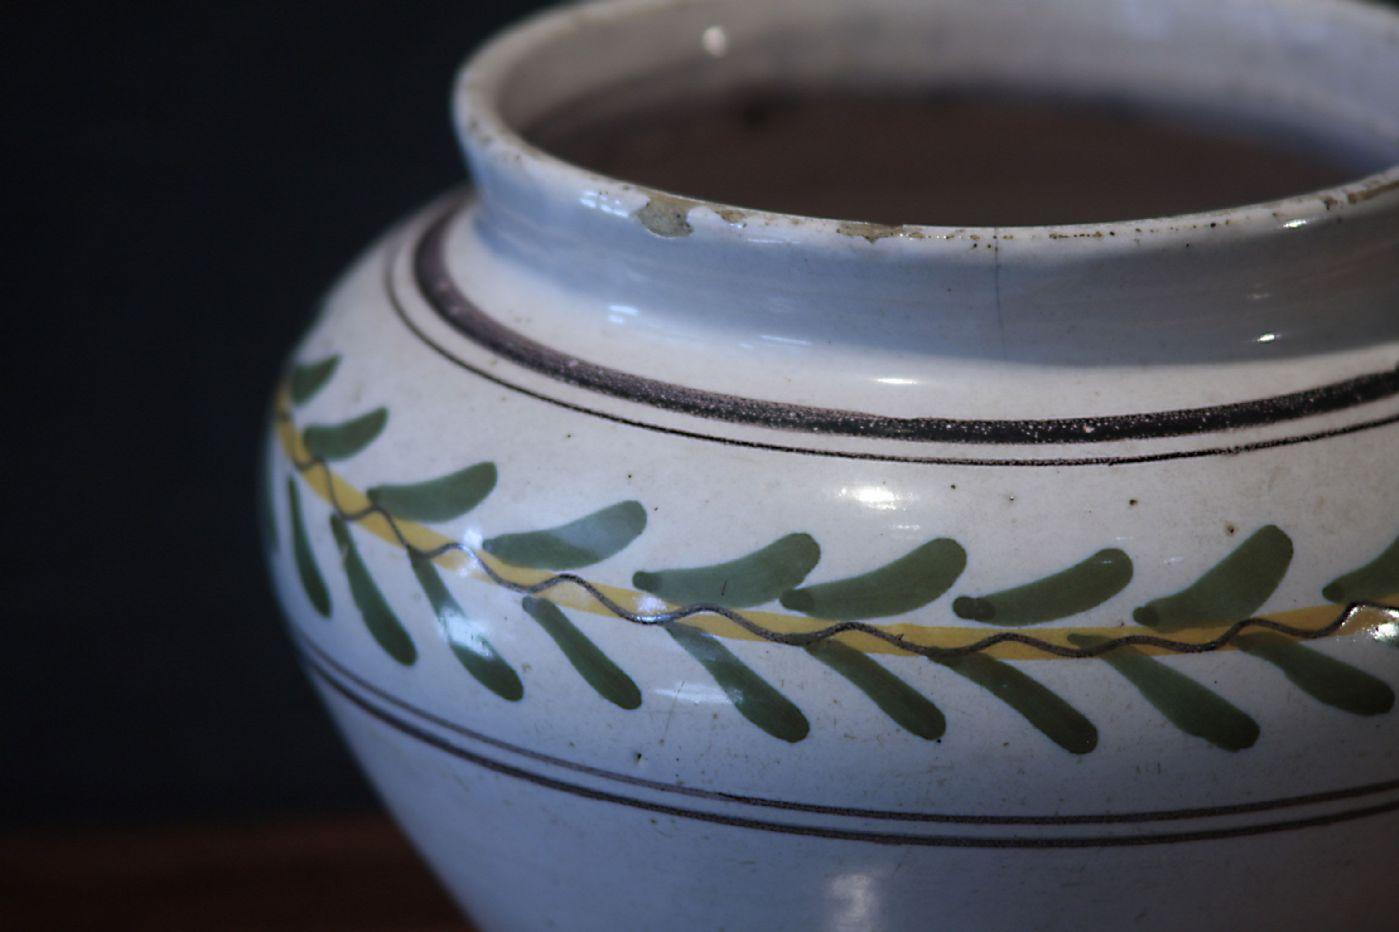 thumb4|Vaso in Maiolica, Siena, Luigi XVI